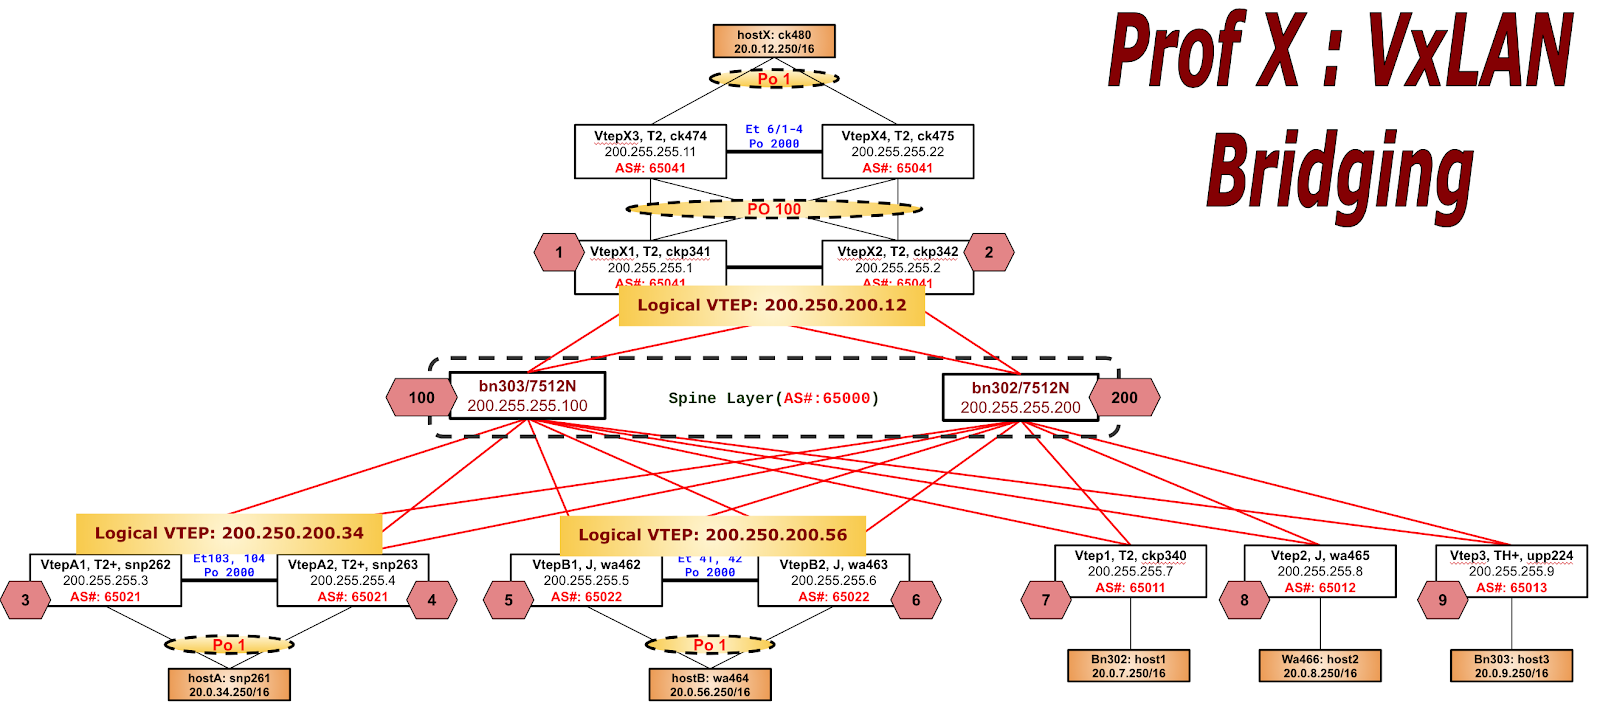 Arista EOS/Networking Tips by Solomon Yang: Arista L3 Leaf